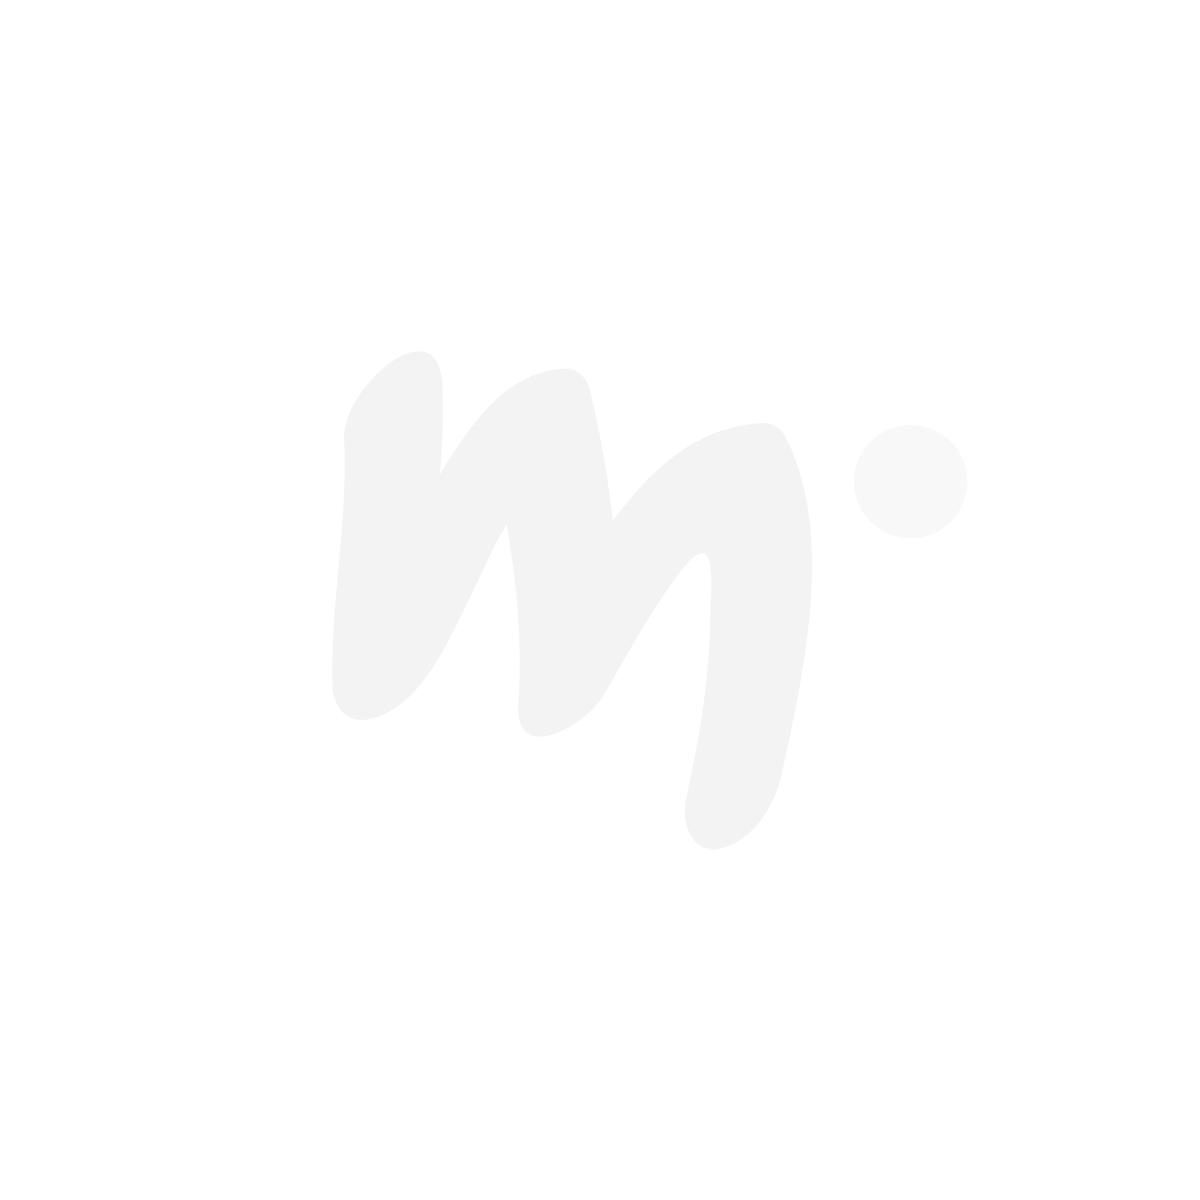 Muumi Hahmot-nuolija M